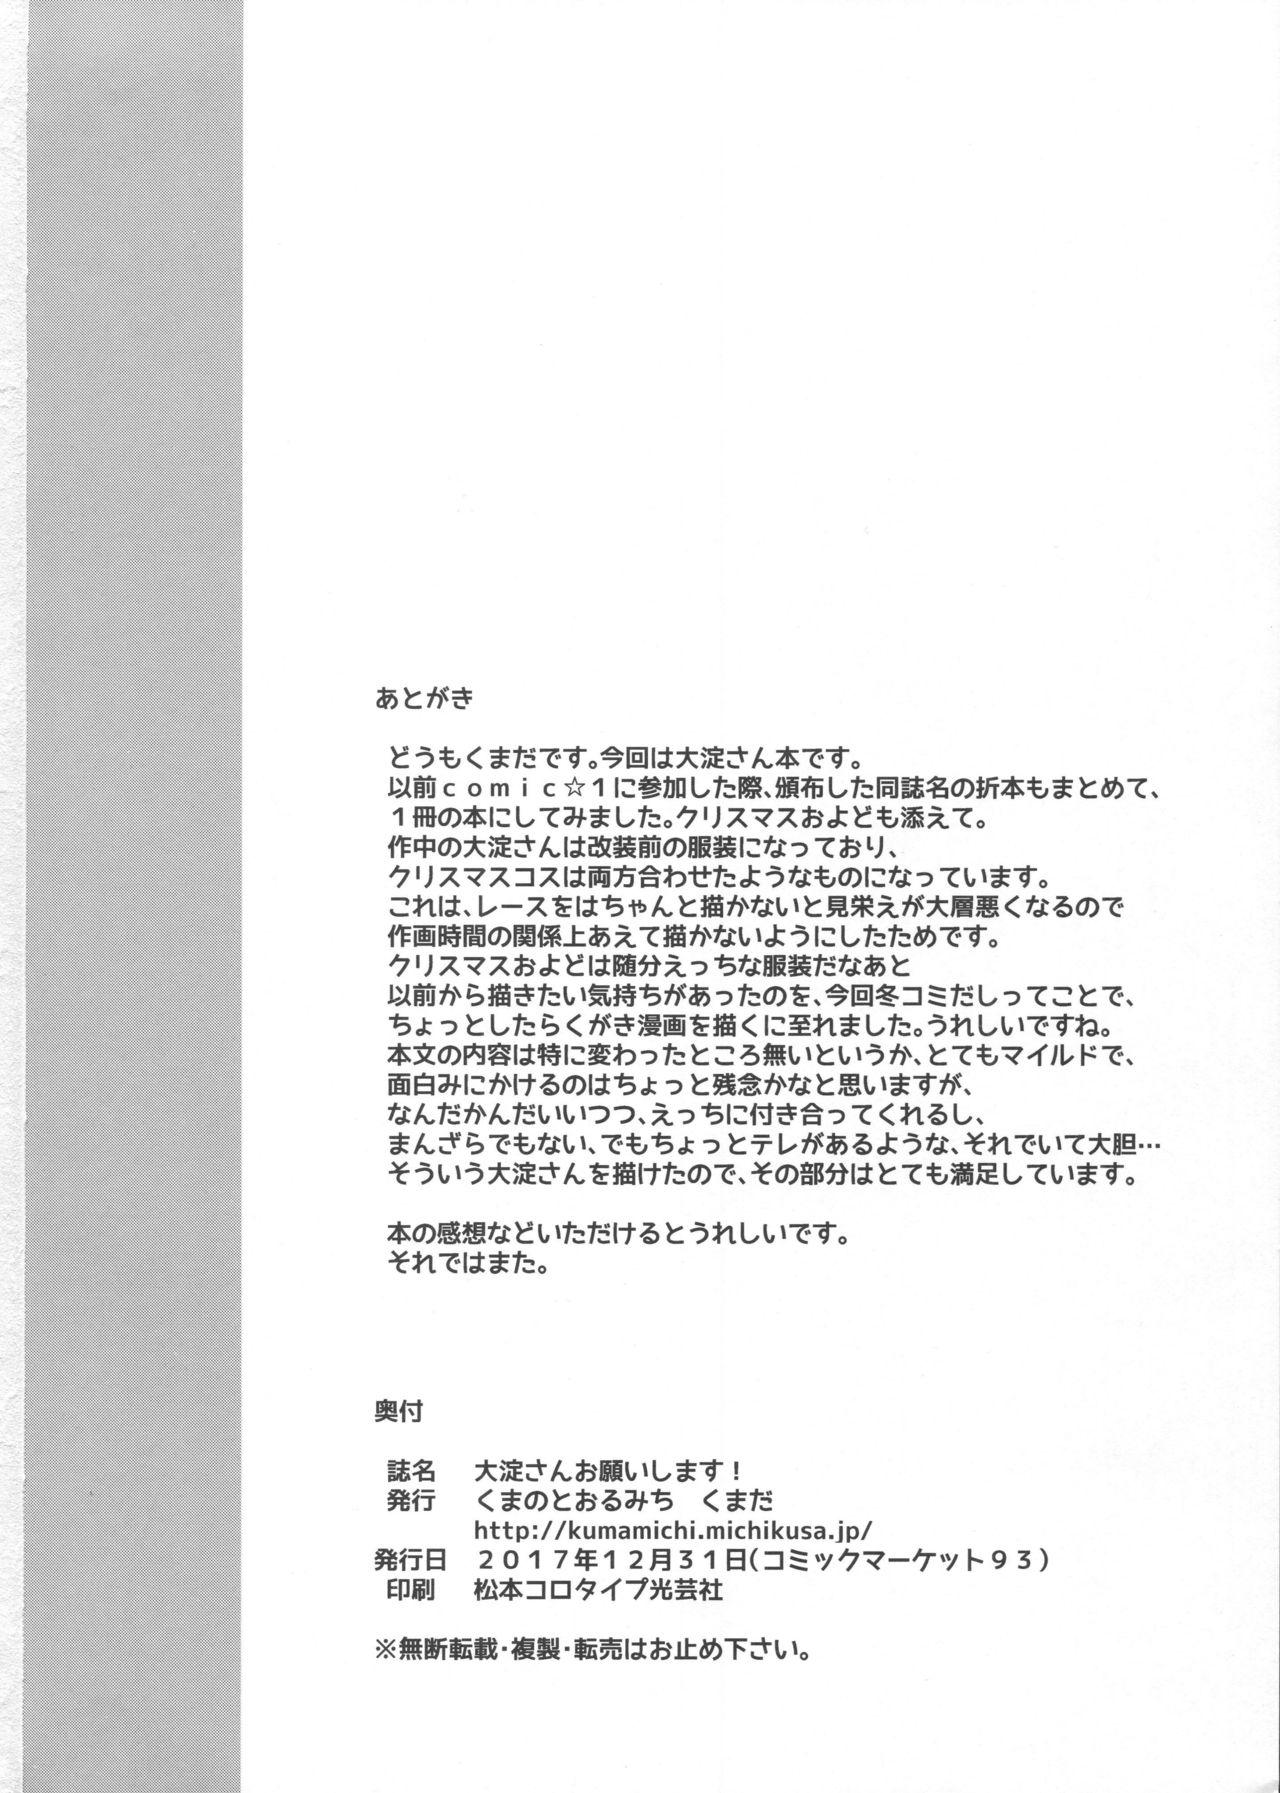 Ooyodo-san onegaishimasu! 24